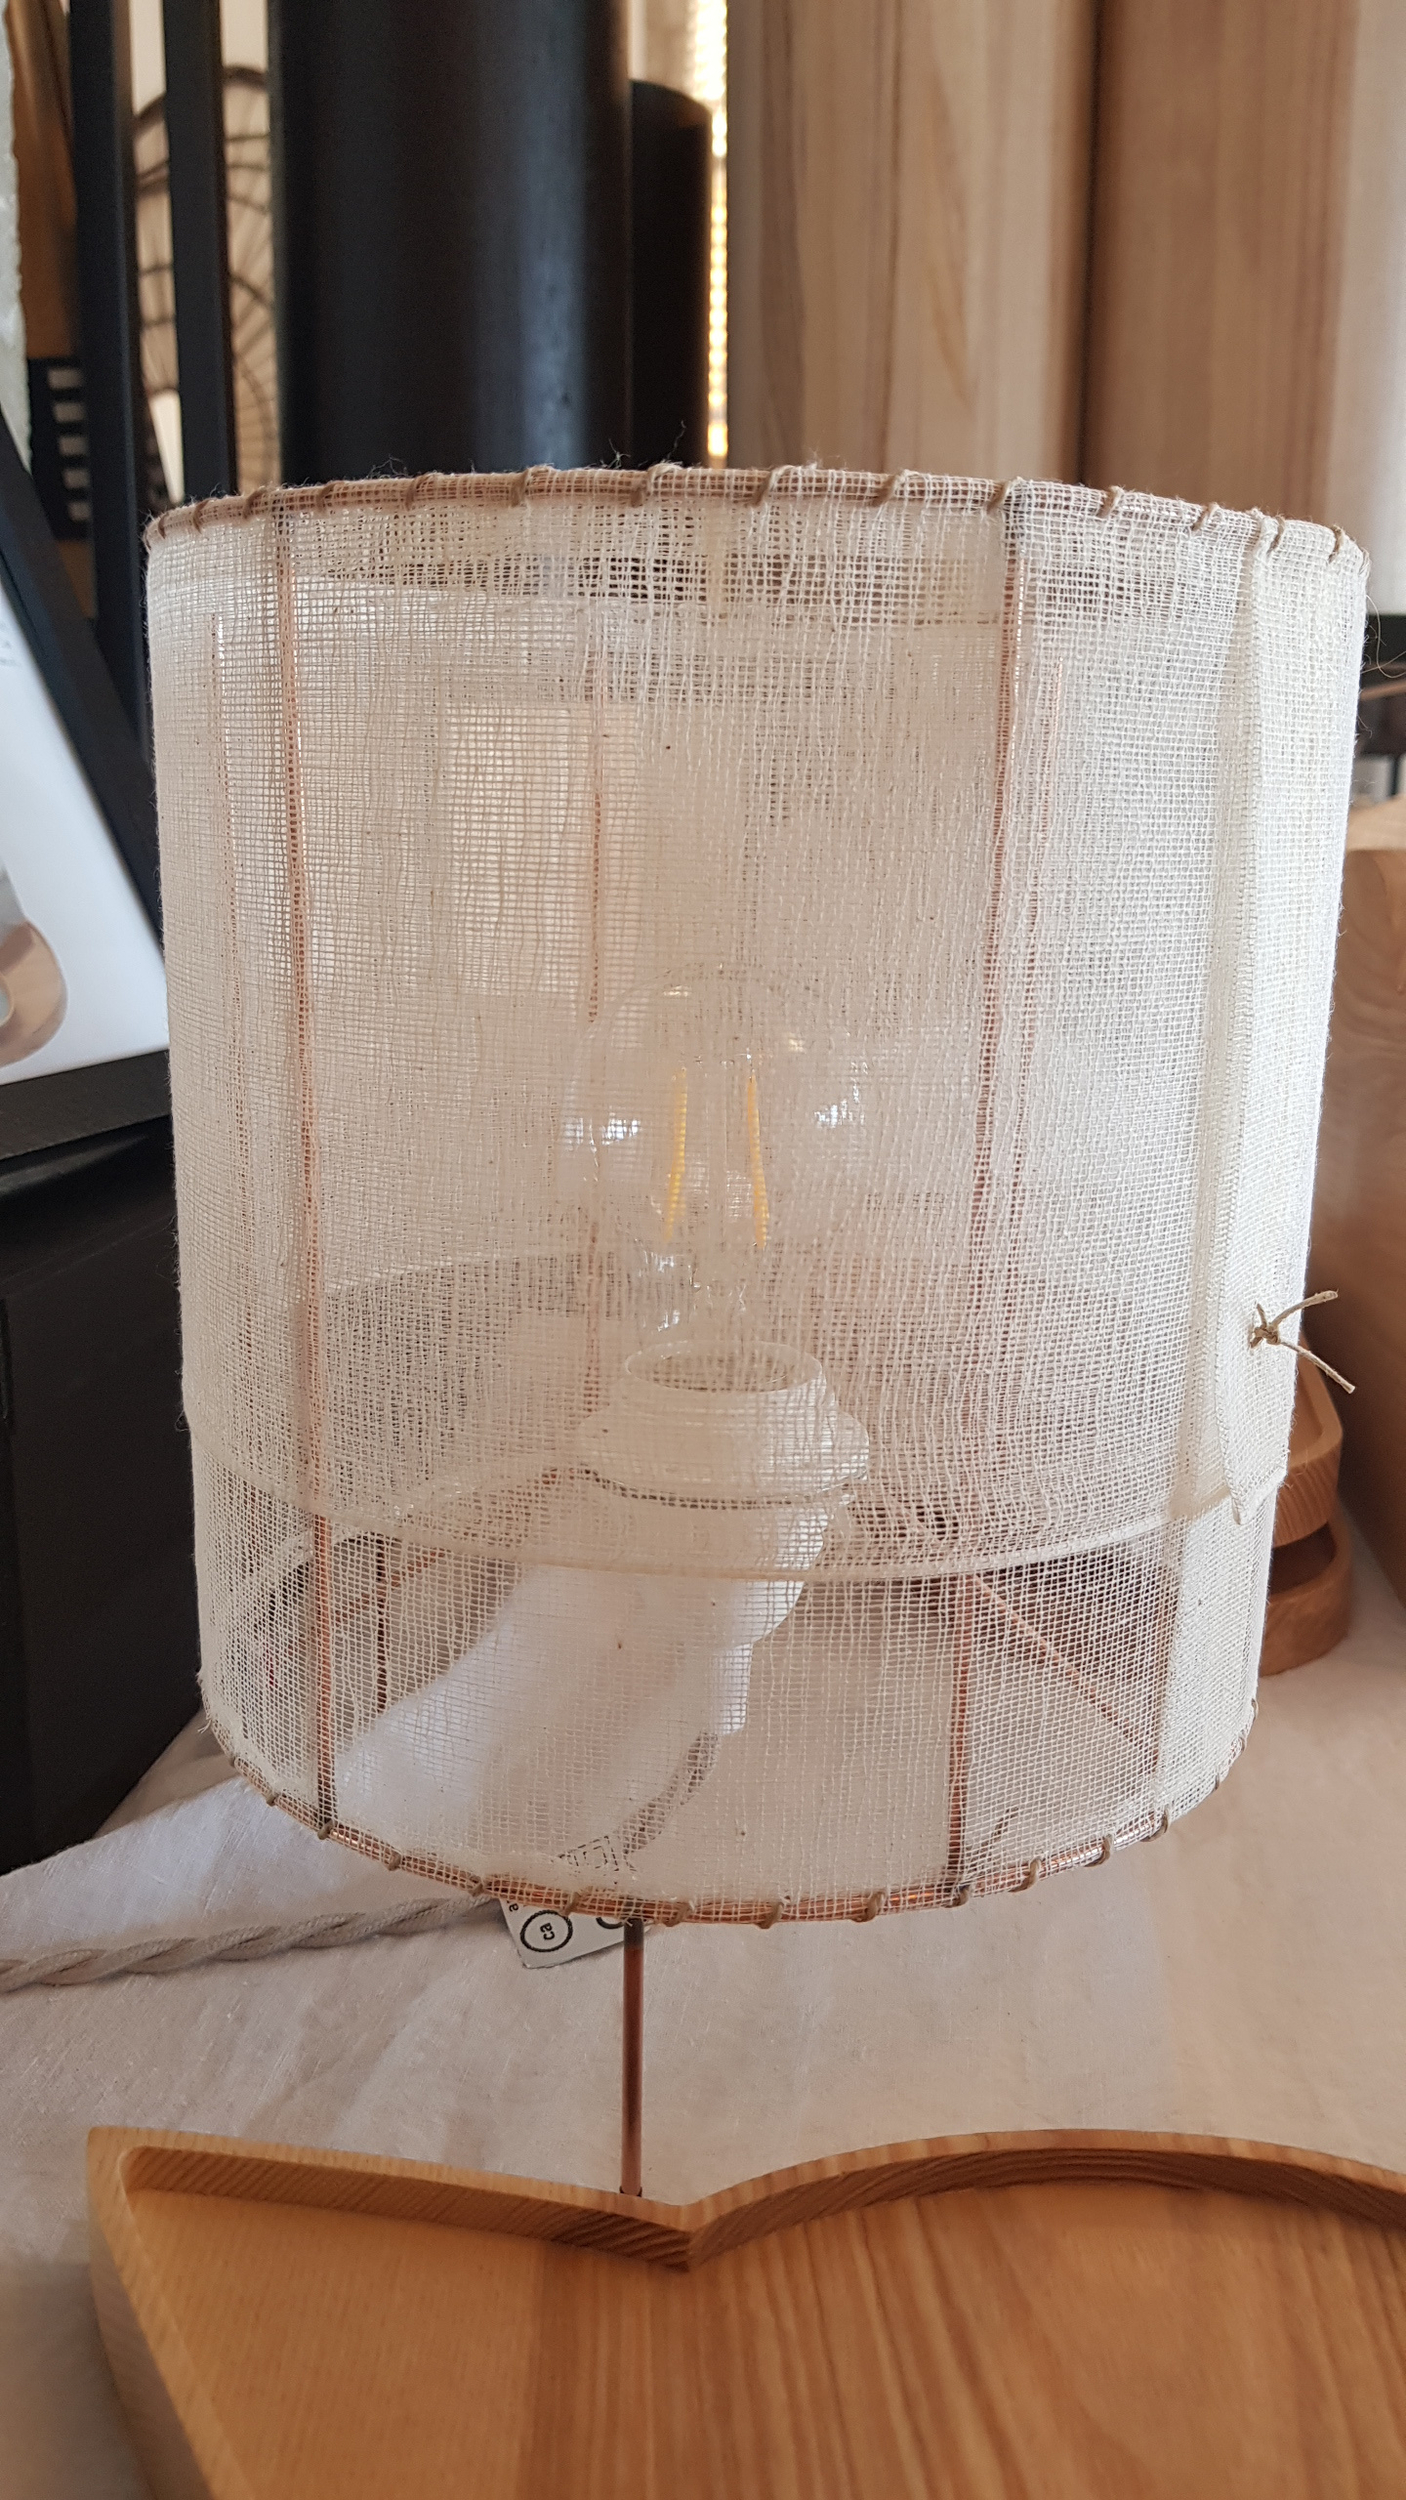 Lampe à poser 20x20 cherie cherie